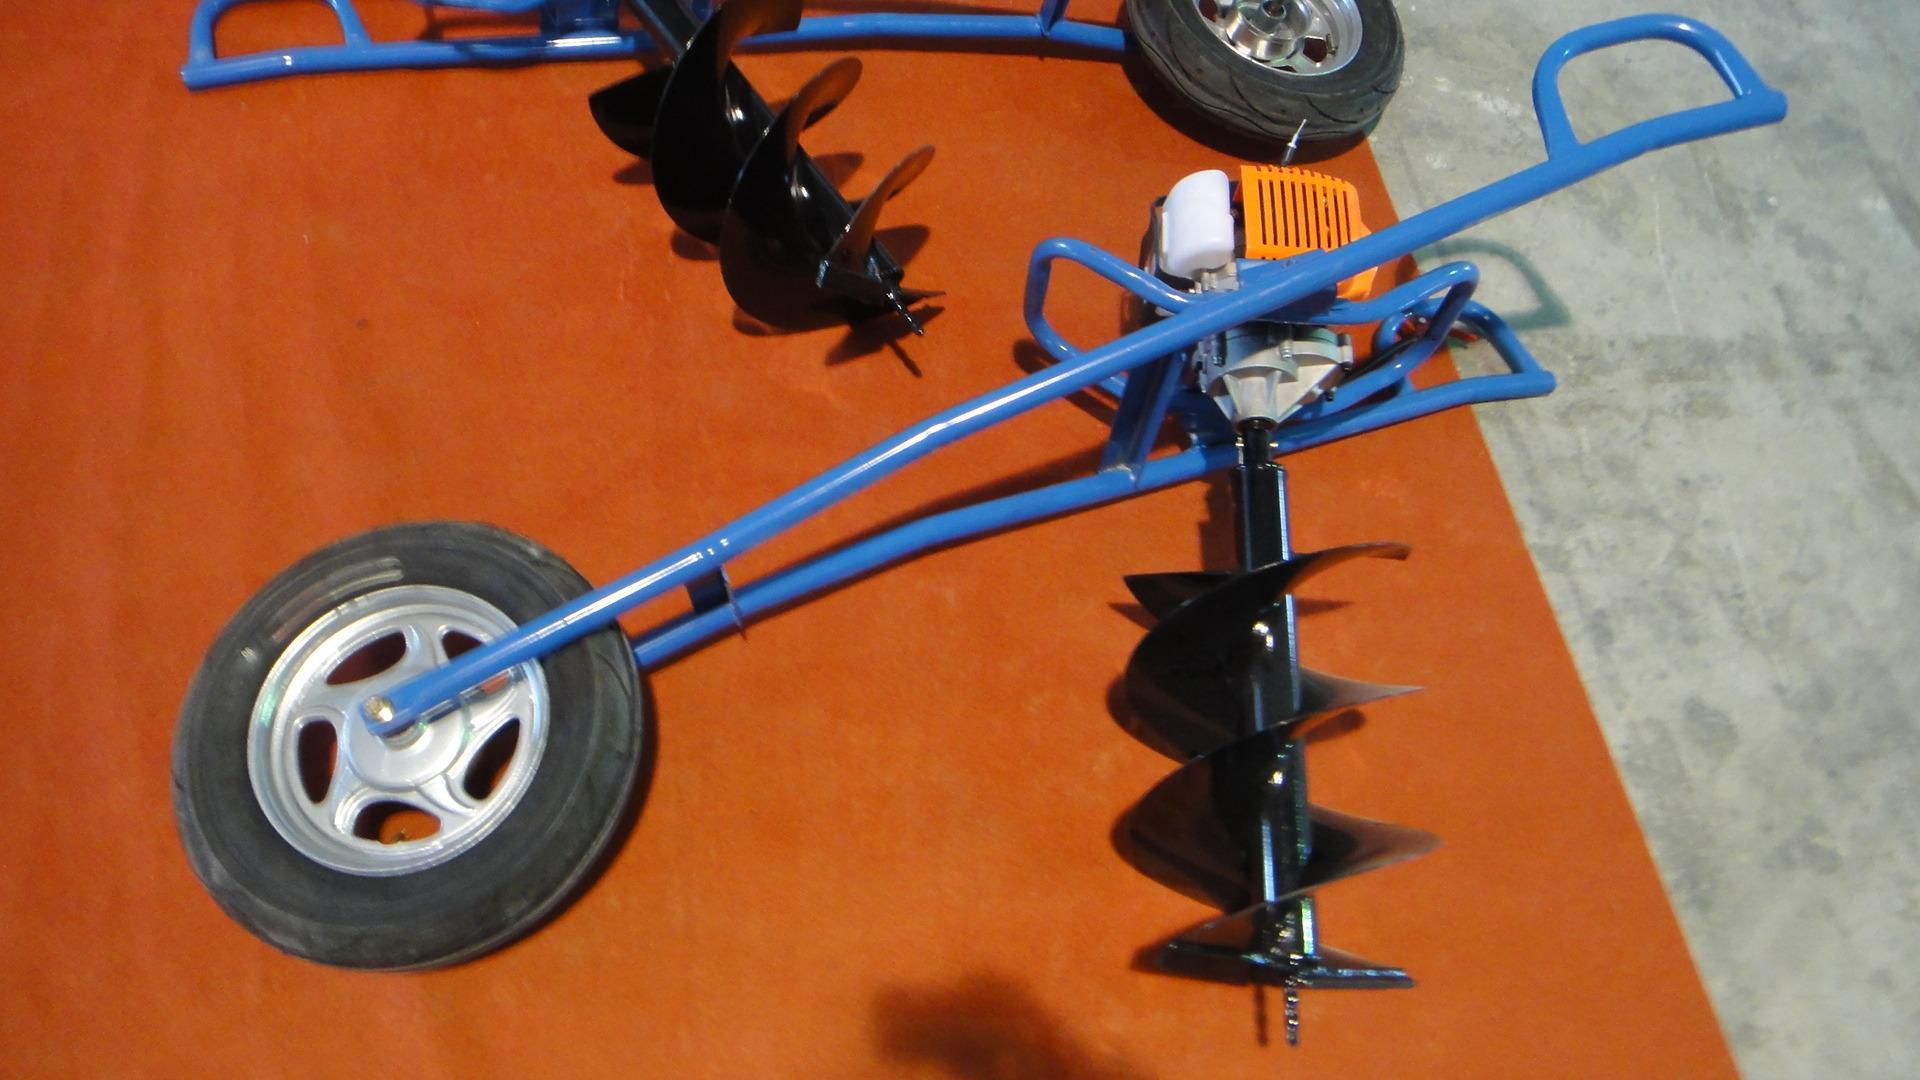 Hand drilling, small pit digger wheelbarrow drill  labor-saving drill 6